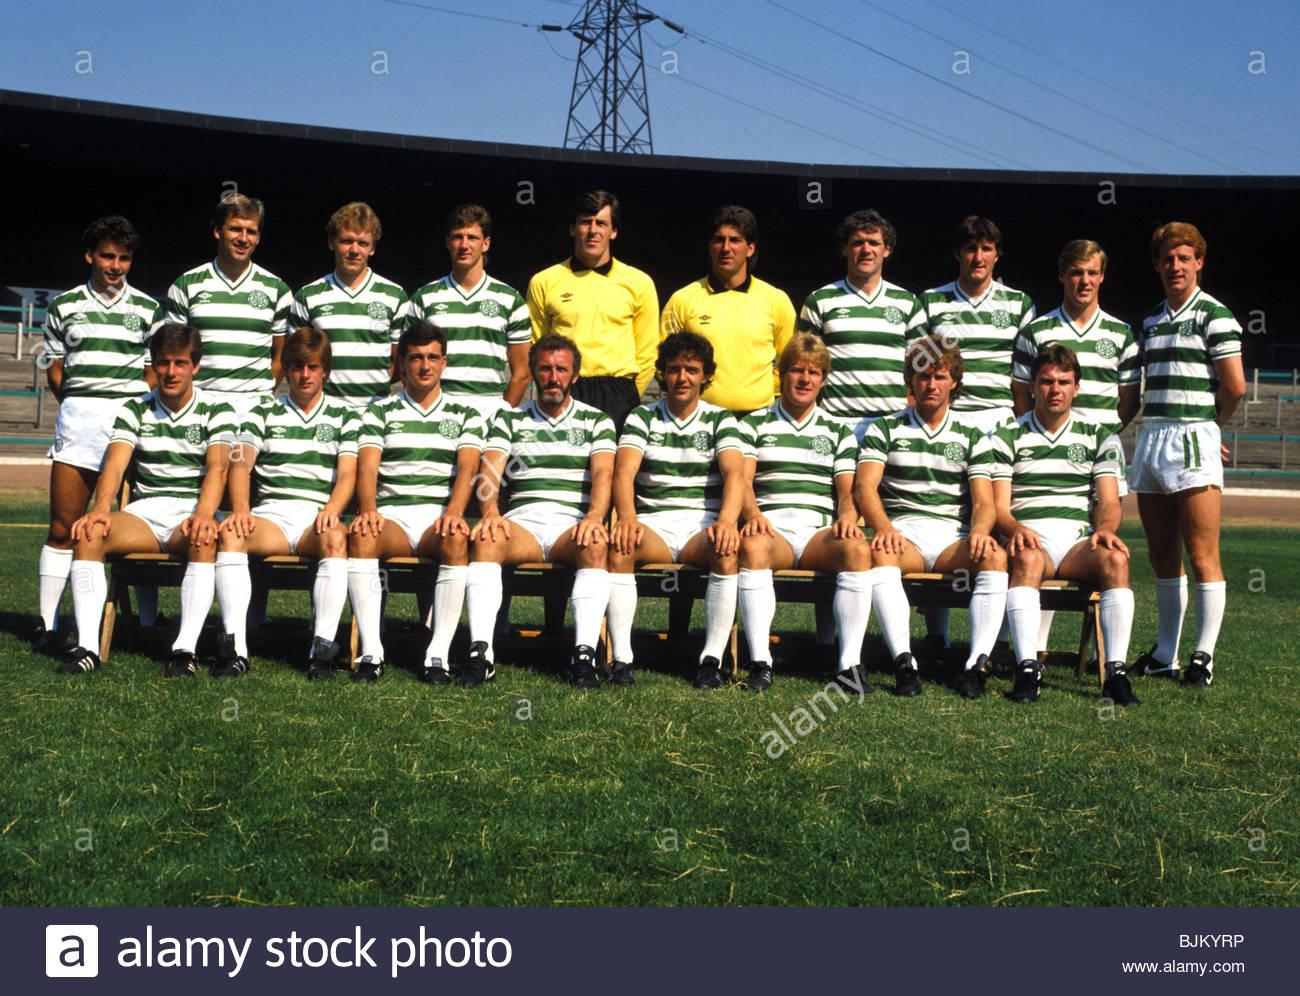 SEASON 1984/1985 CELTIC Celtic team picture - Stock Image